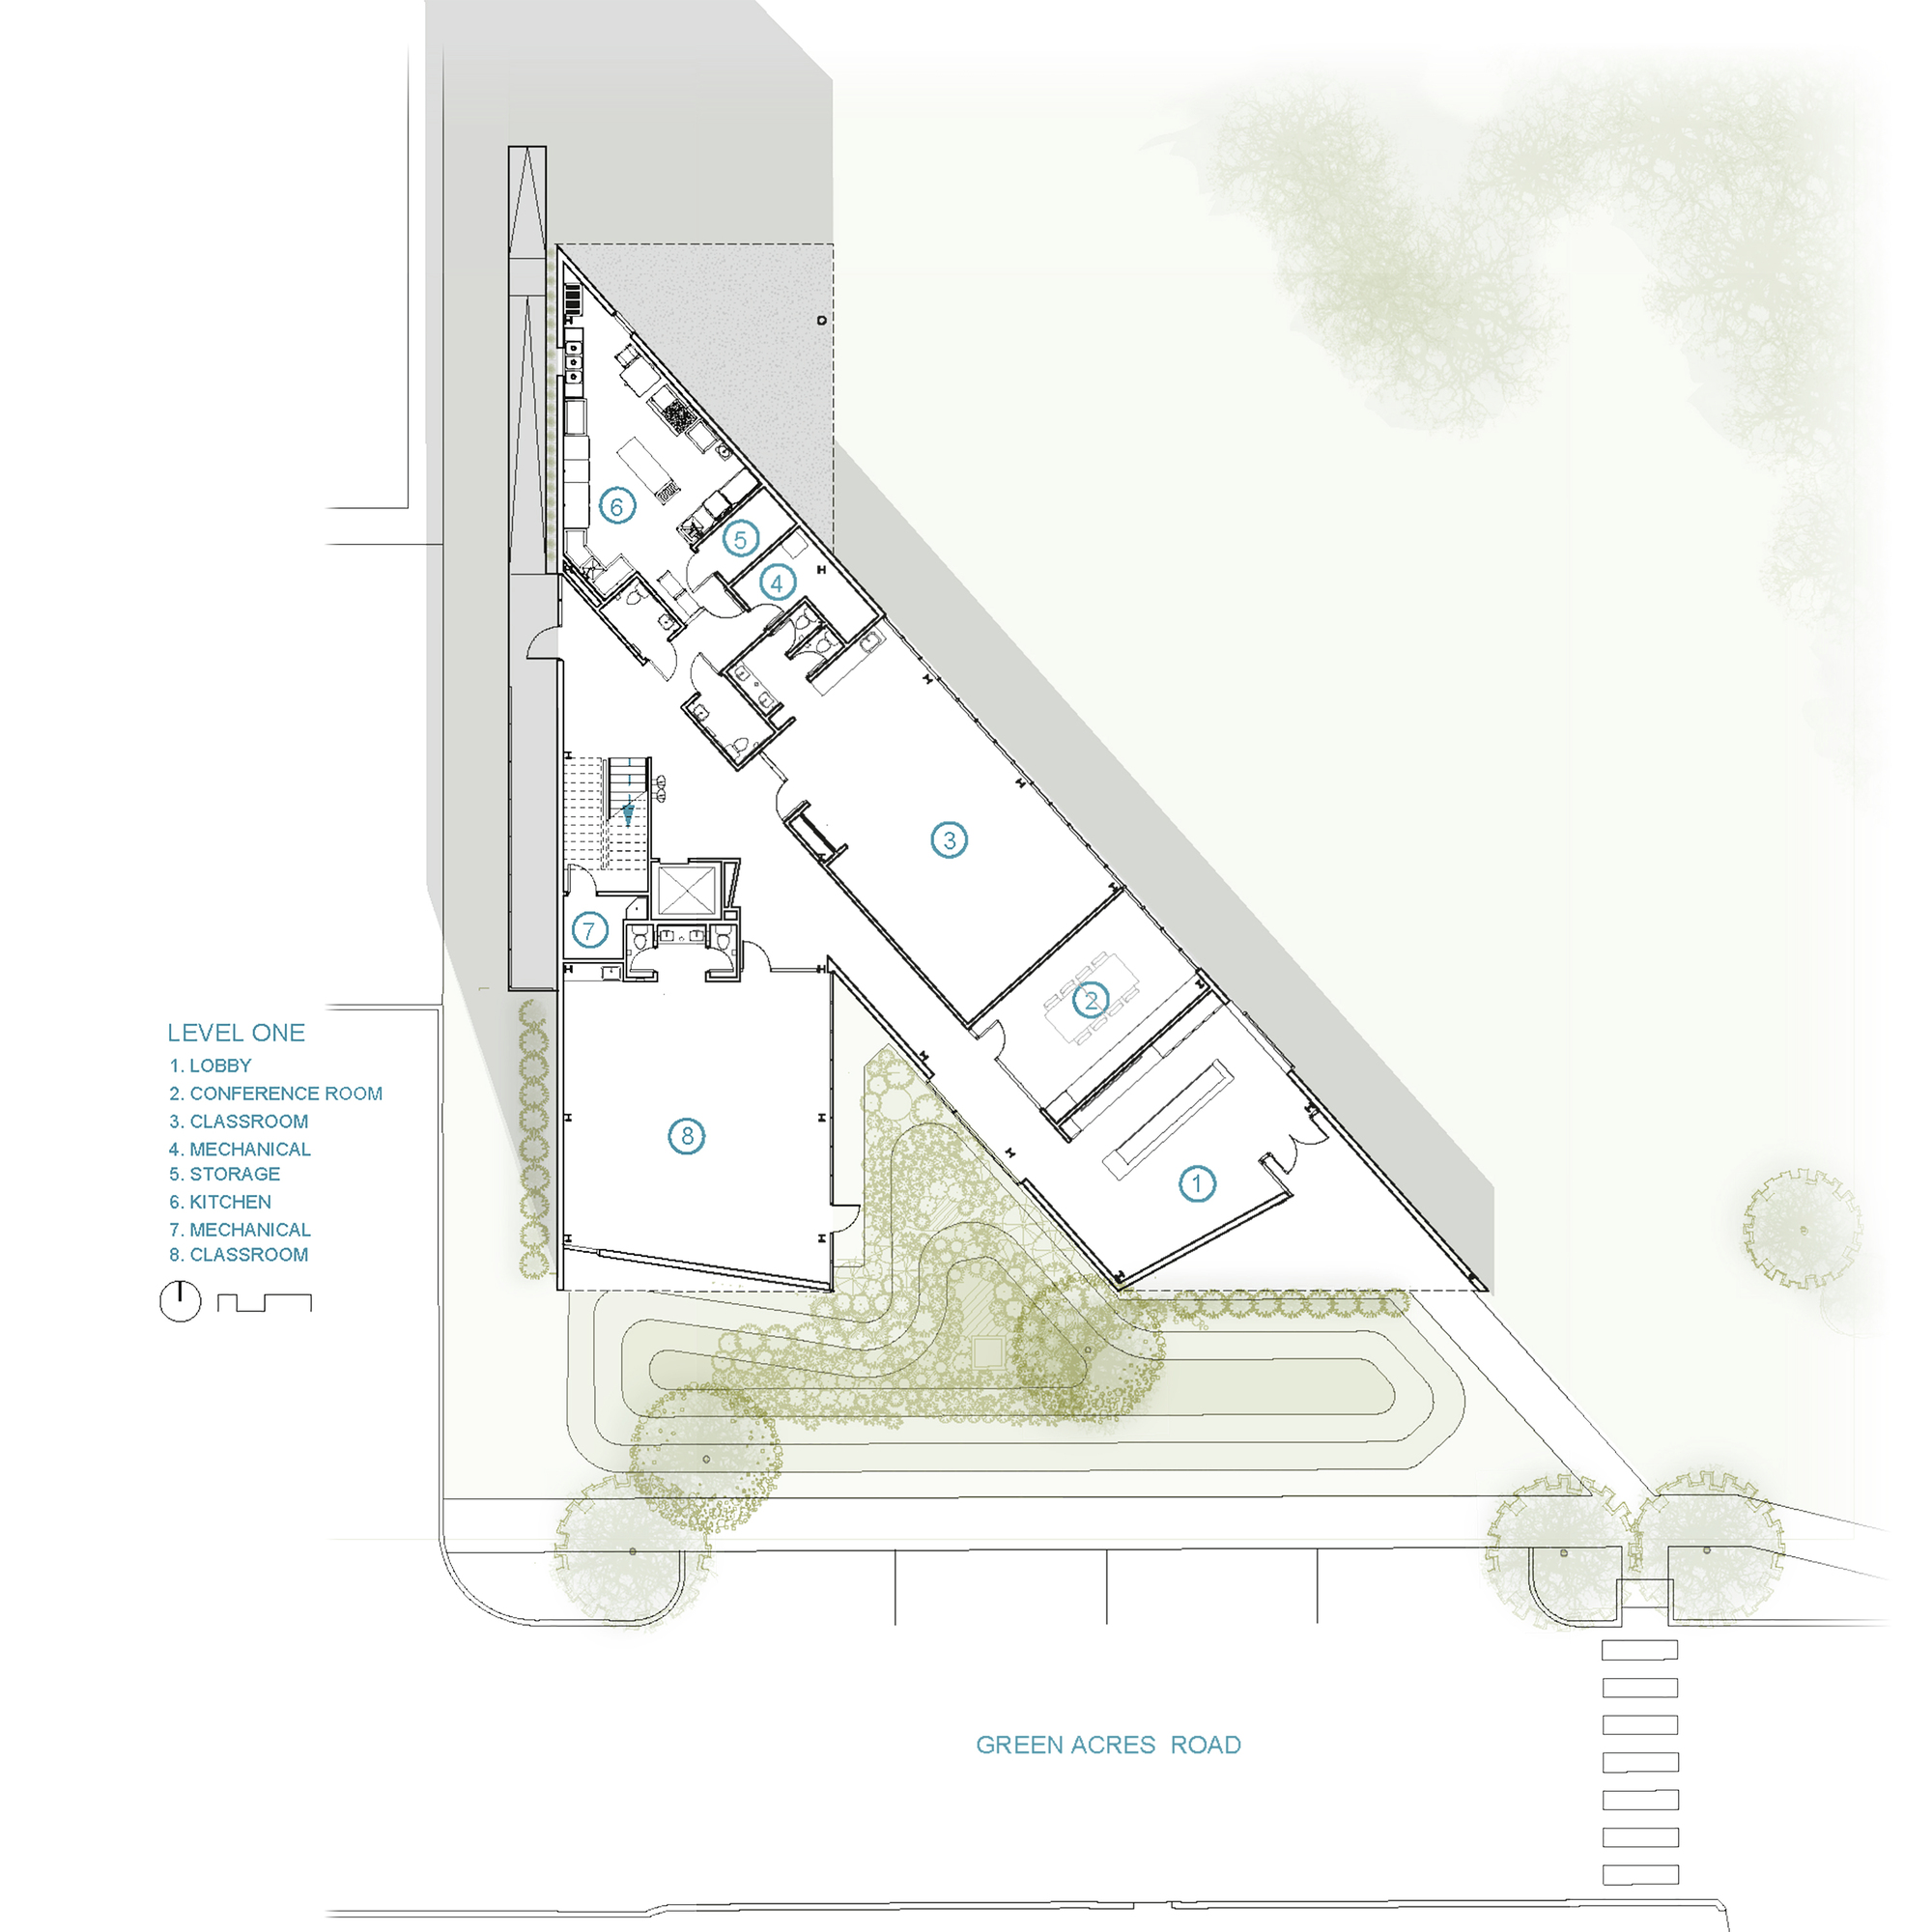 Patio Floor Plans Gallery Of Fayetteville Montessori Elementary School